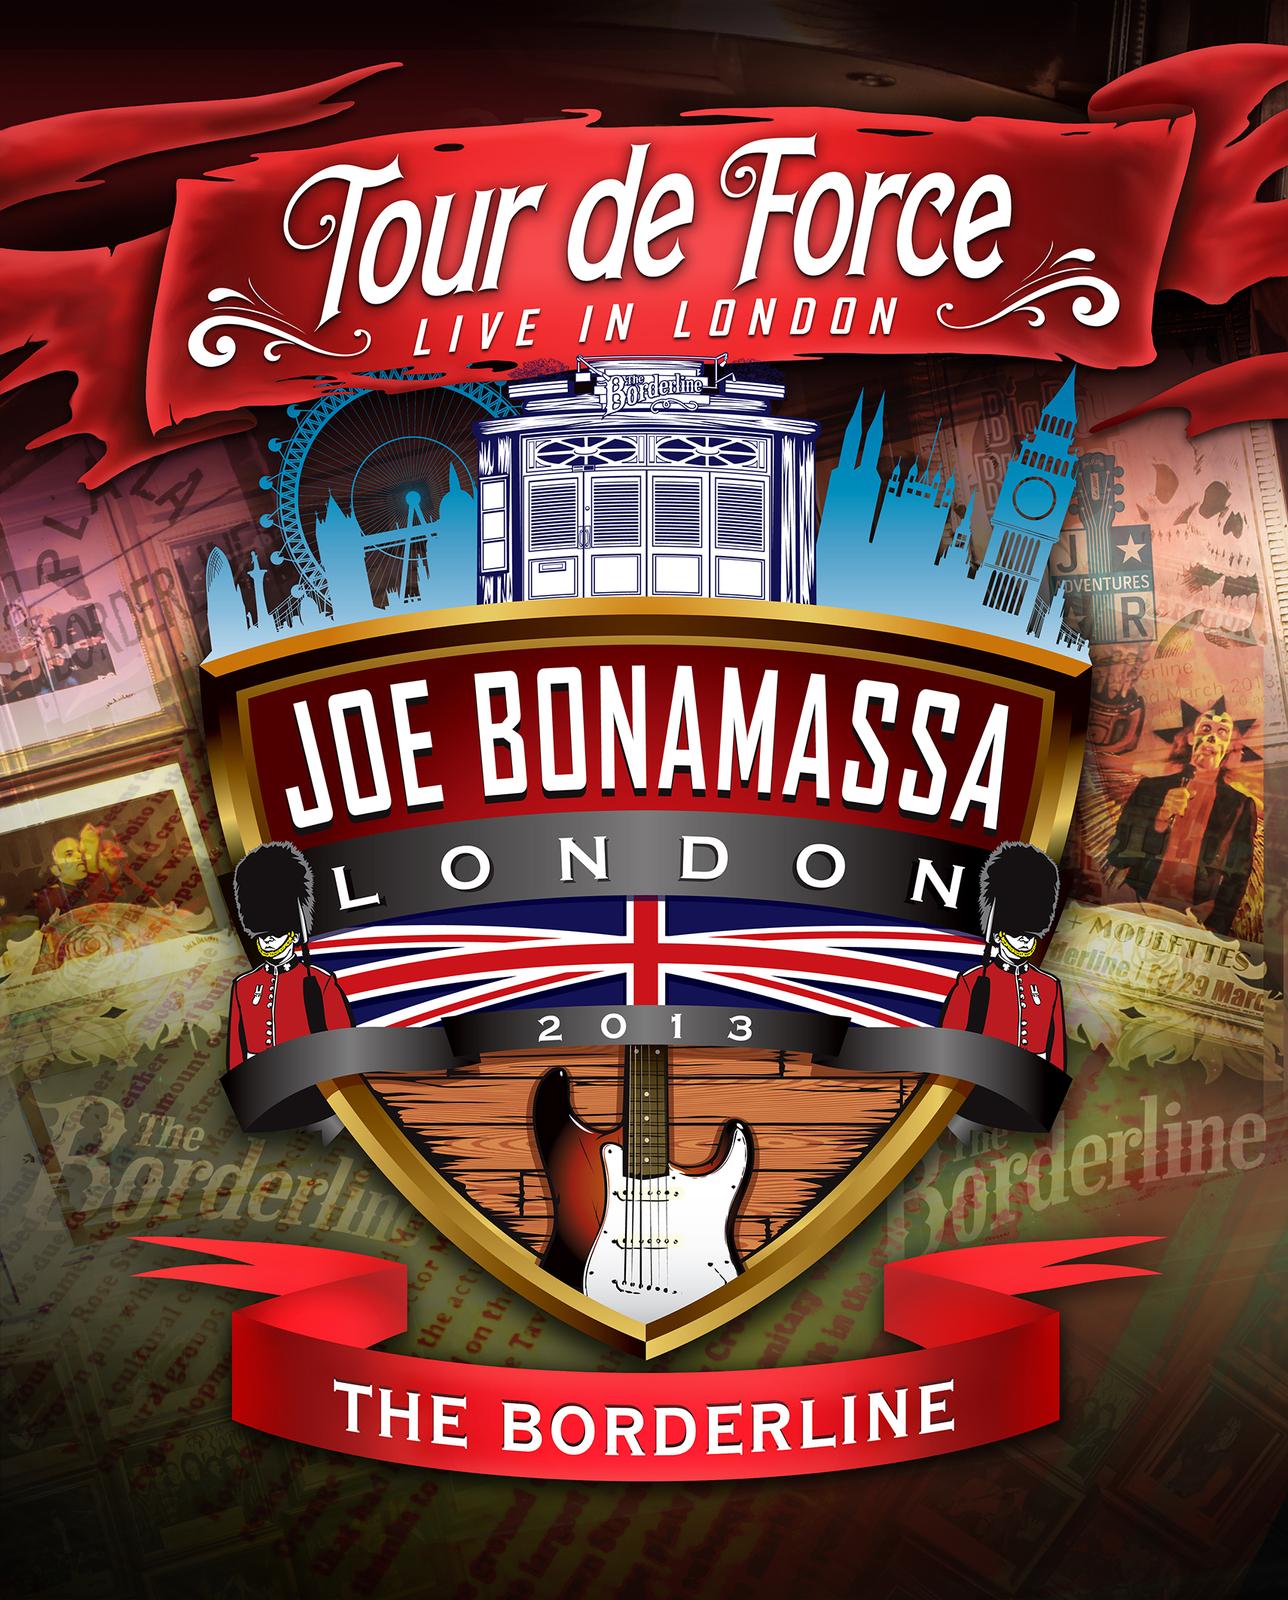 Joe Bonamassa Tour De Force: Live In London - The Borderline - Power Trio Jam on DVD image